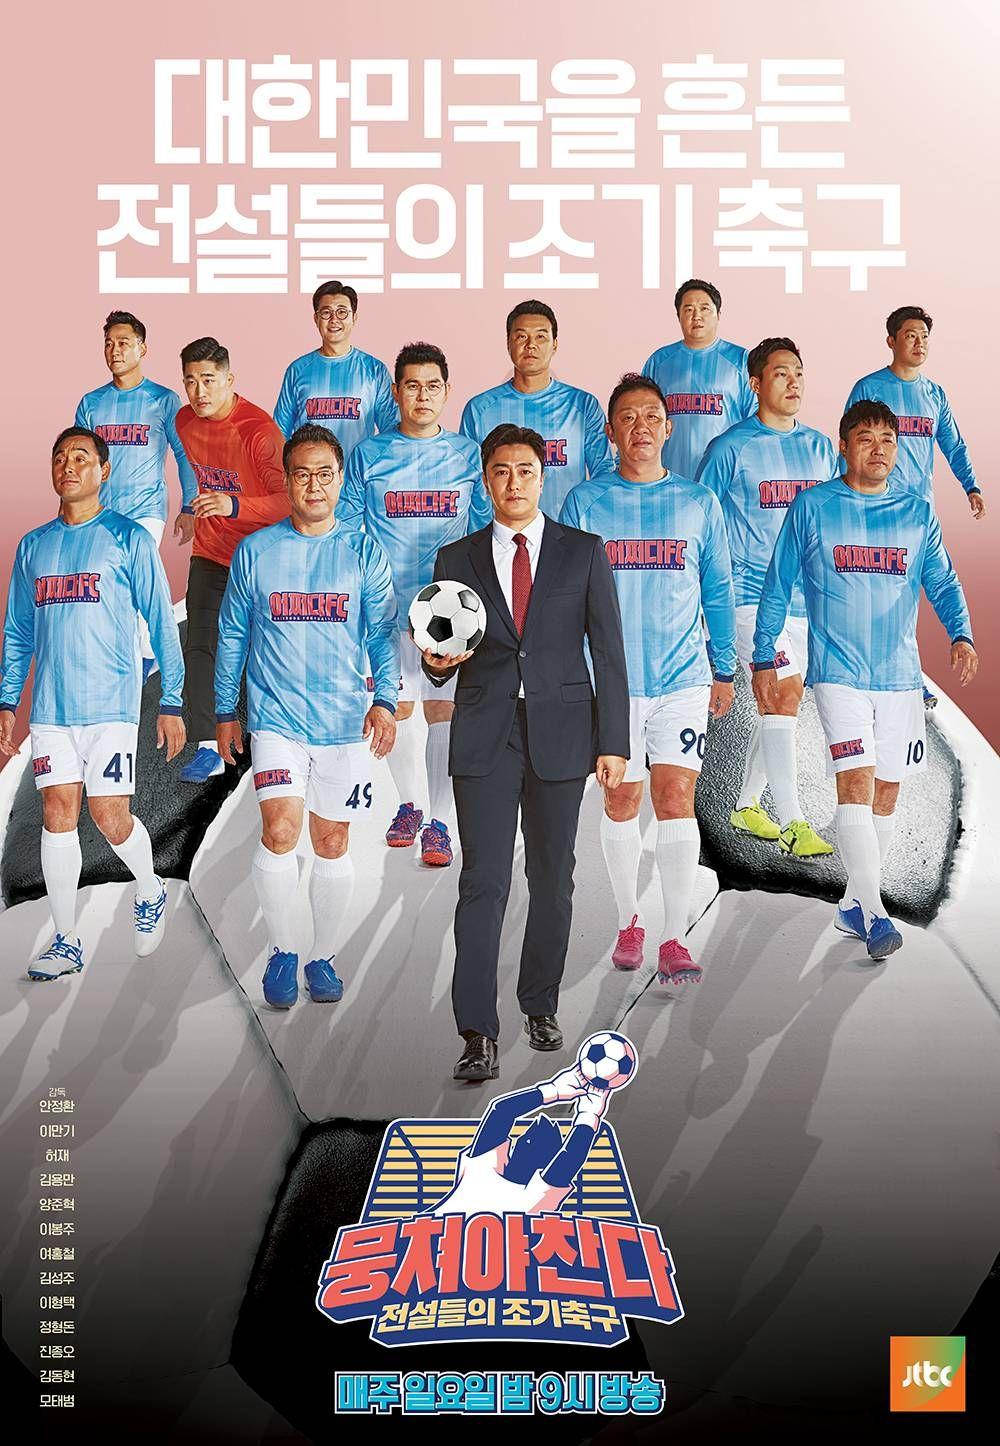 Let's Play Soccer Together 2